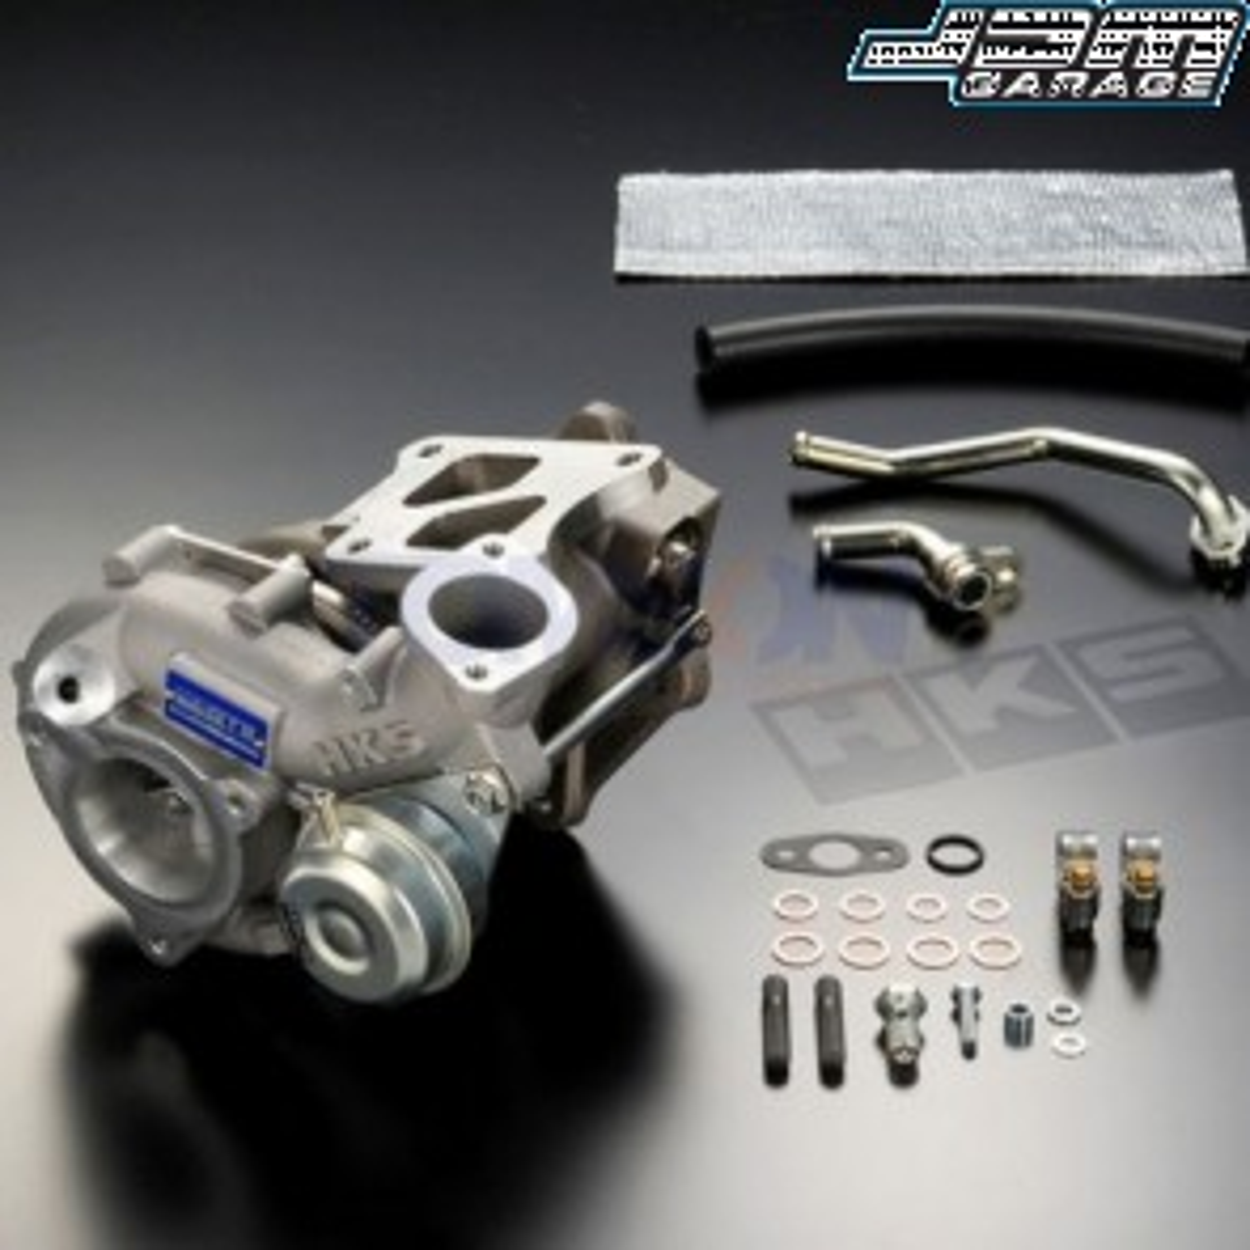 HKS GTII 7460 Sports Turbo Kit Fits Mitsubishi Lancer Evolution X CZ4A